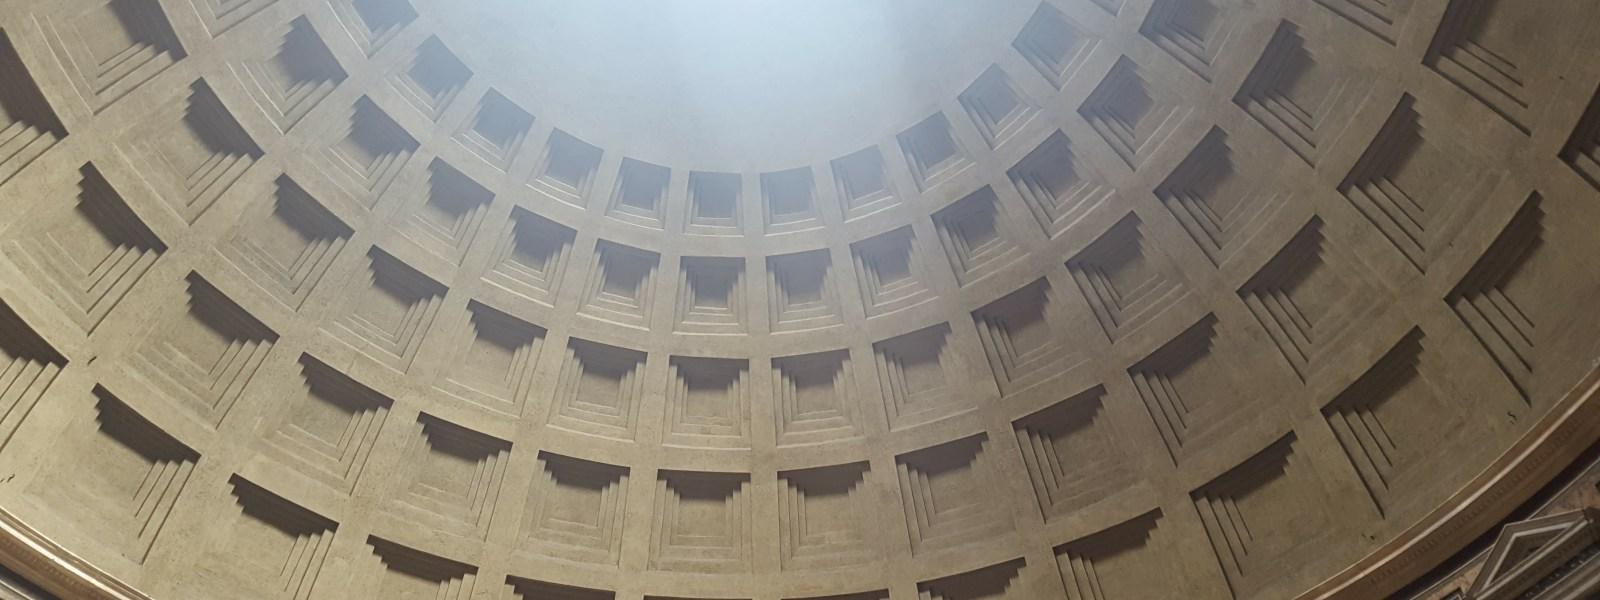 Rome beyond the Vatican: de mooiste kerken en basilieken